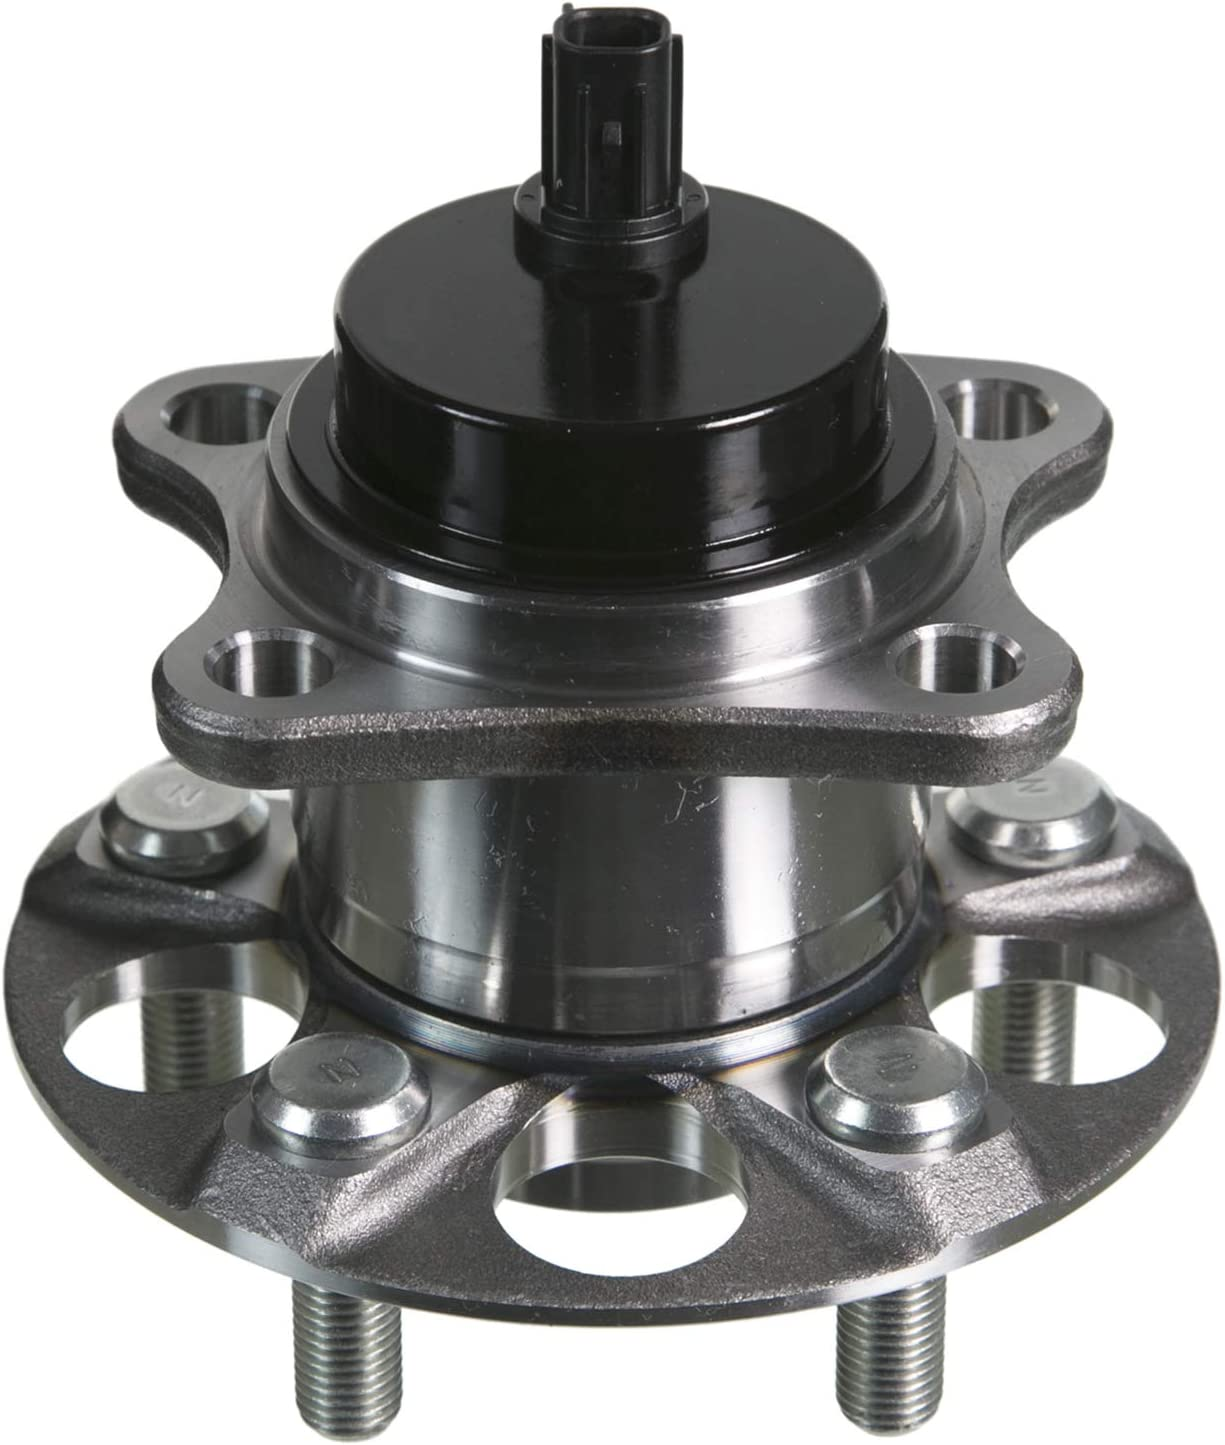 MOOG 512505 Brand new Ranking TOP5 Wheel Bearing and Assembly Hub